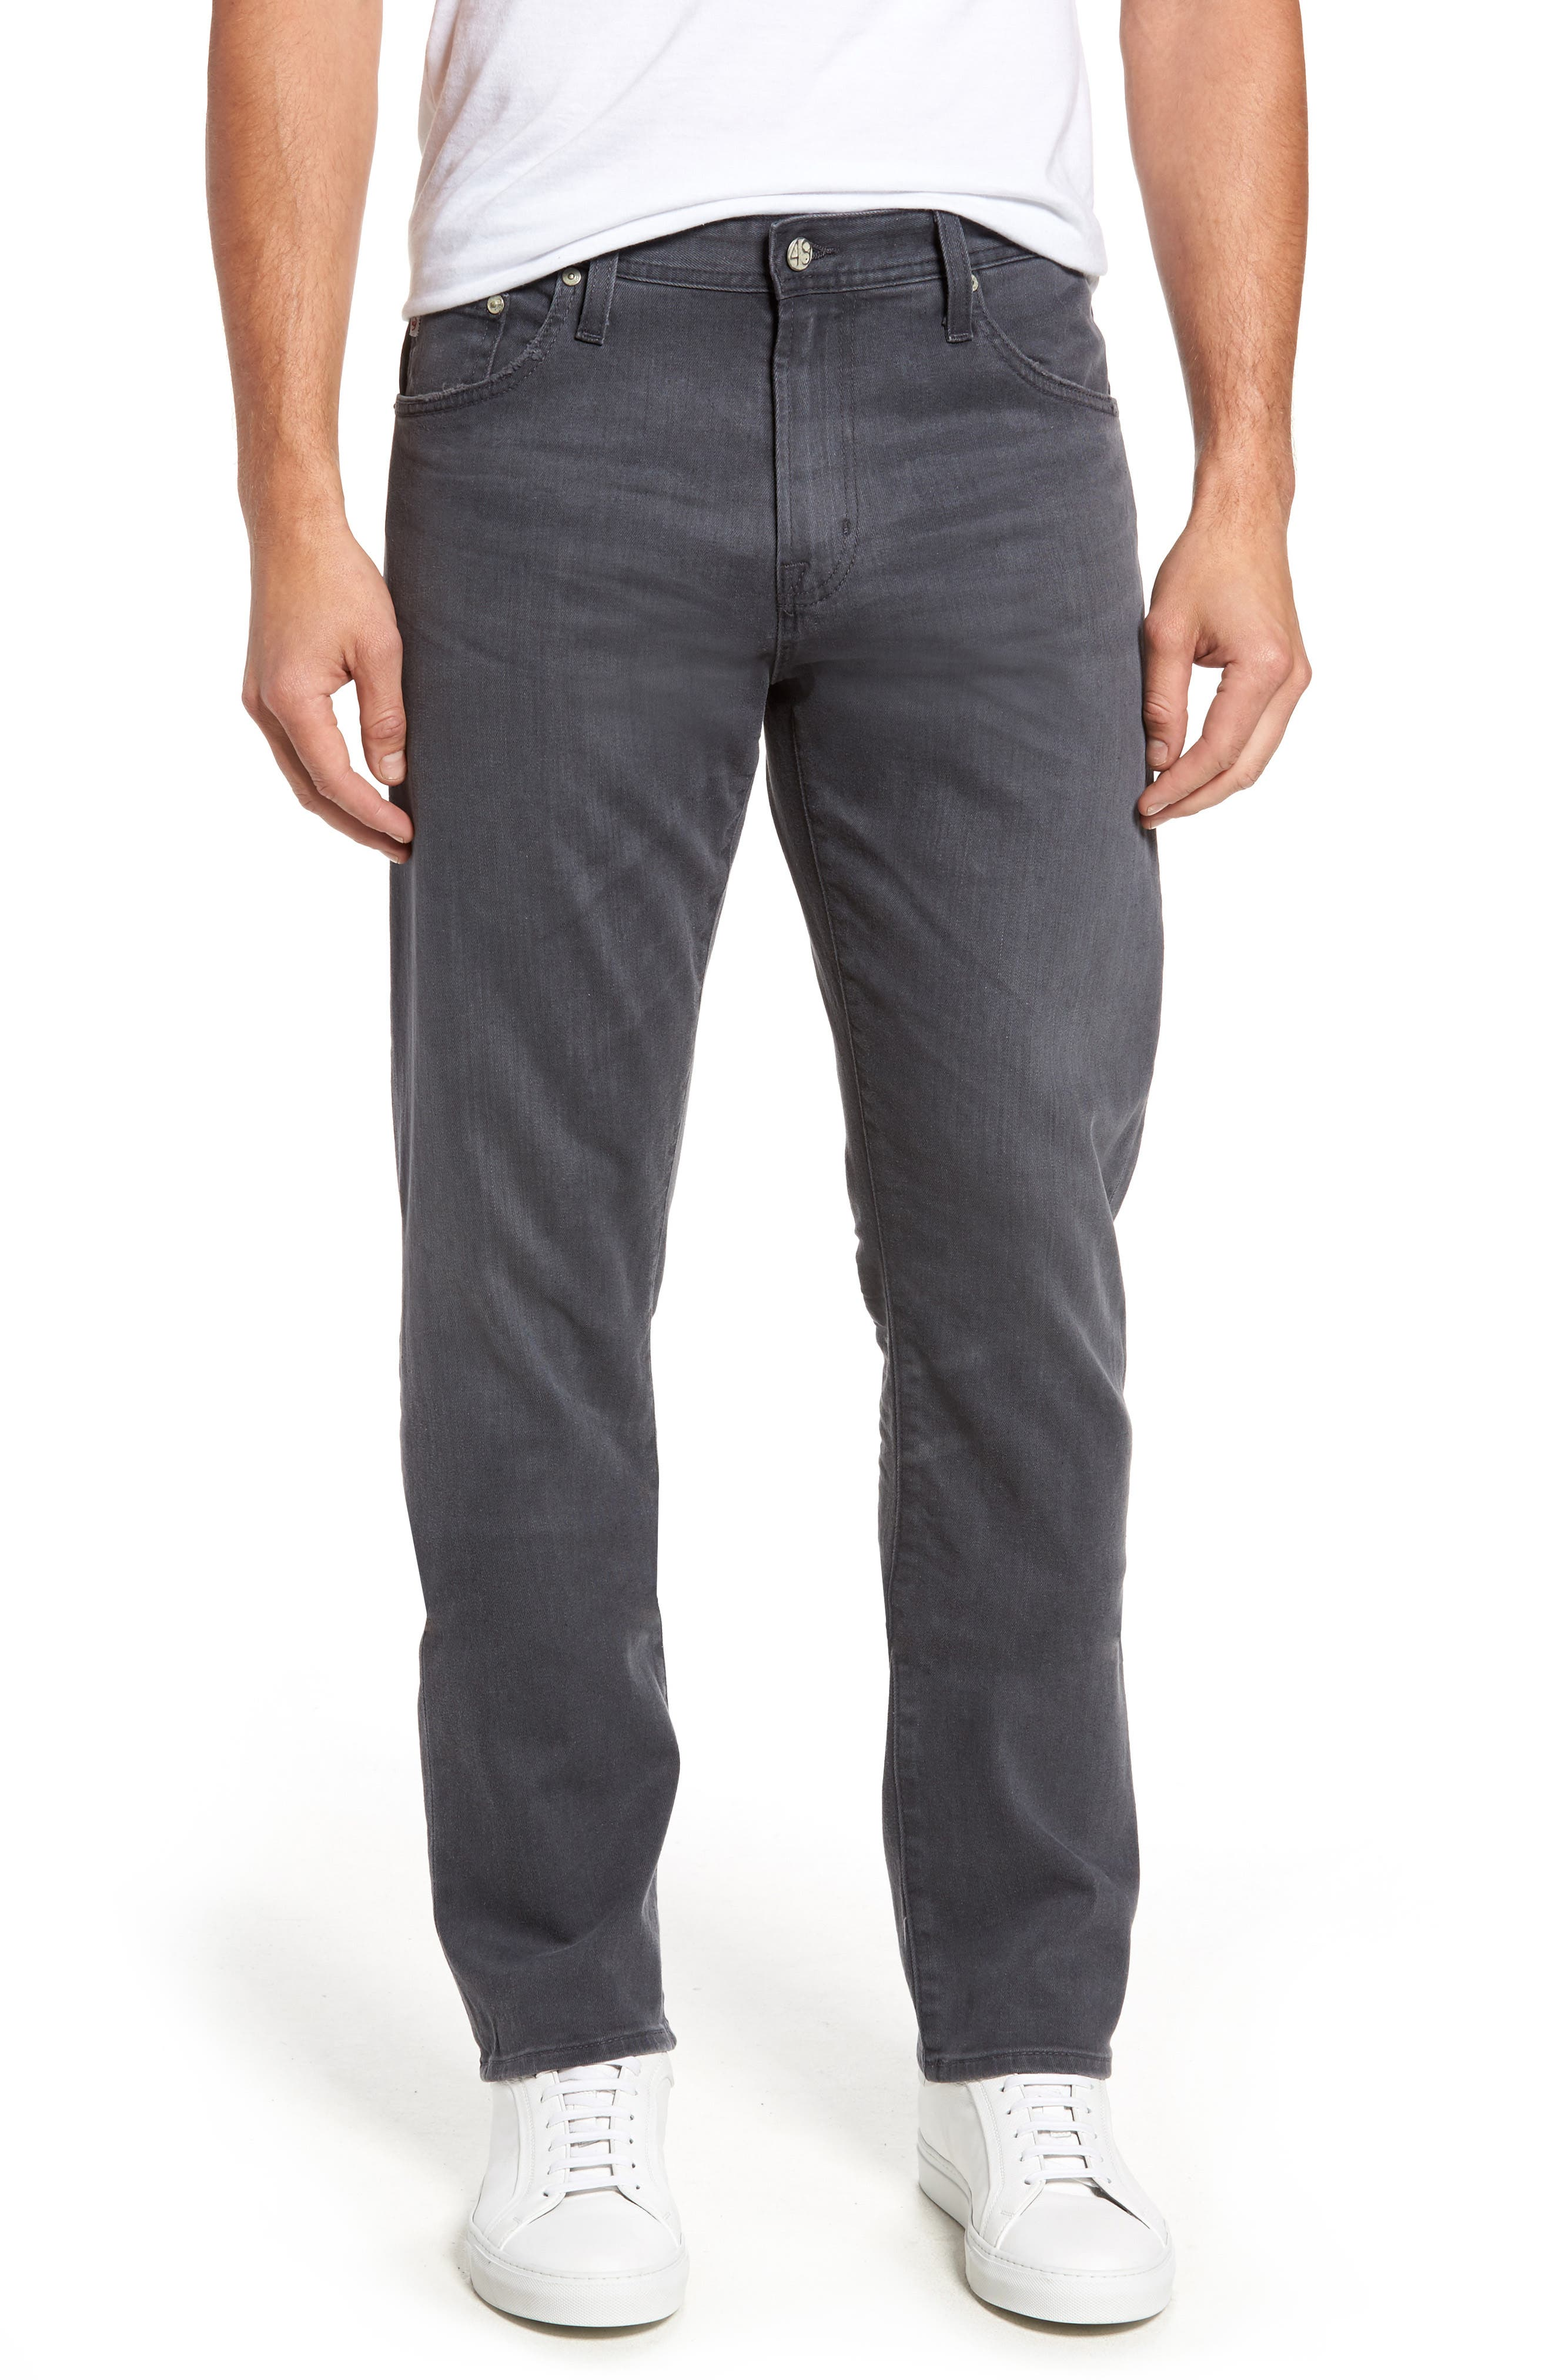 Ives Straight Leg Jeans,                             Main thumbnail 1, color,                             020